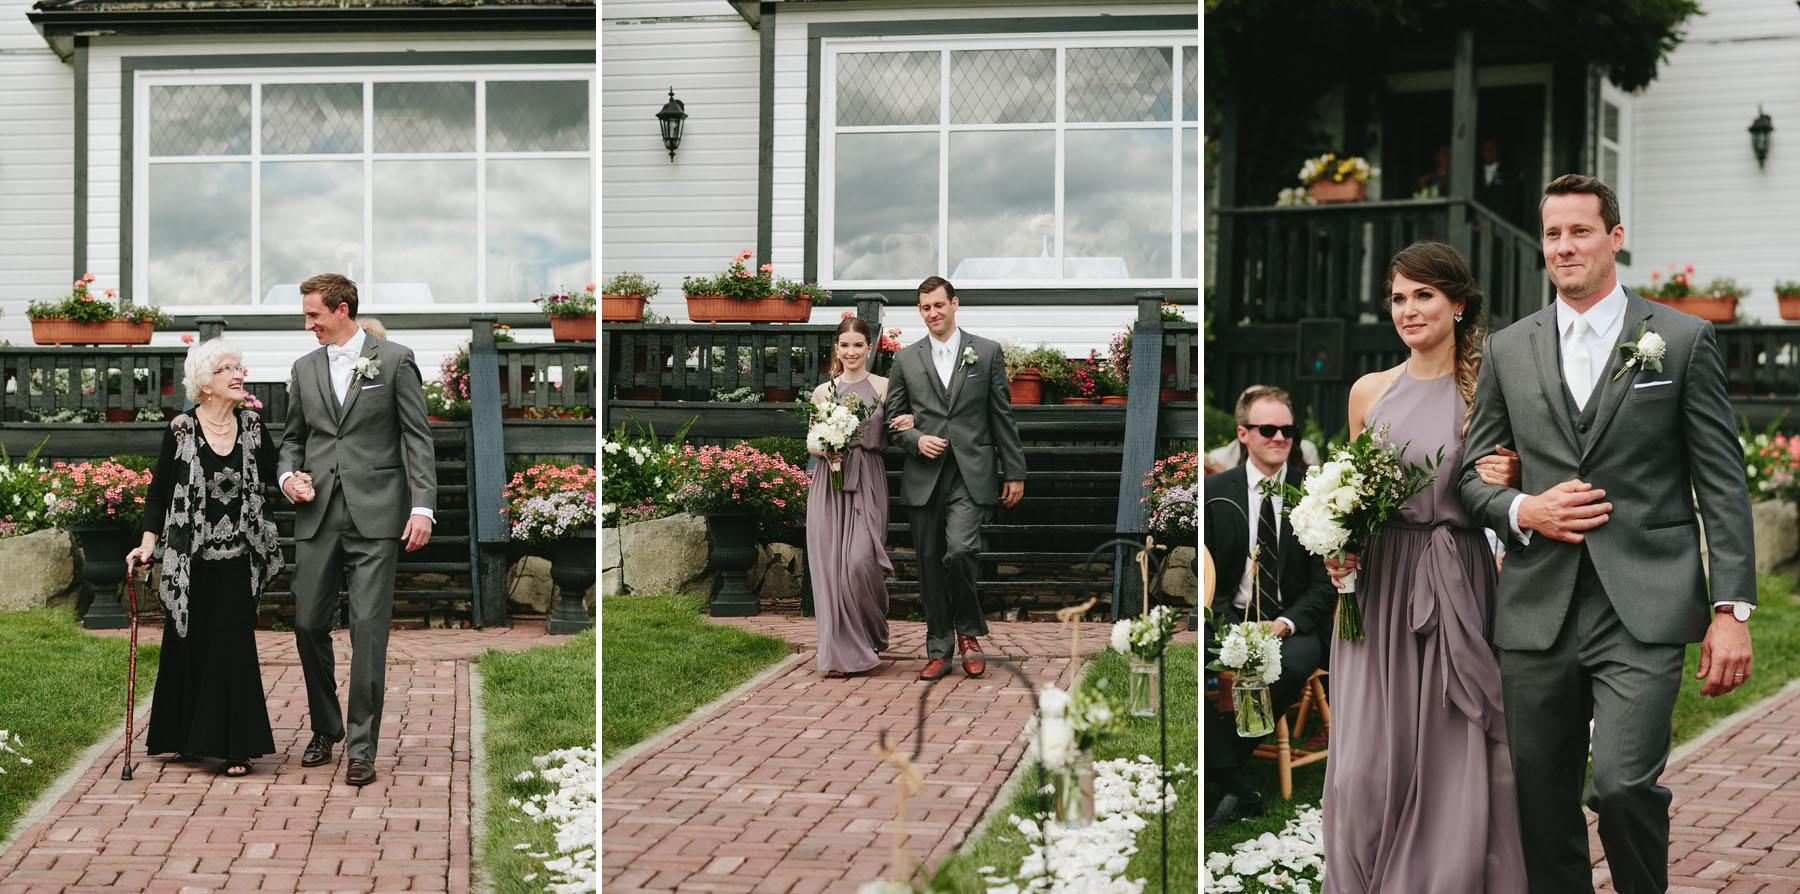 thetis-island-wedding-photographer-rp-rn-066.jpg